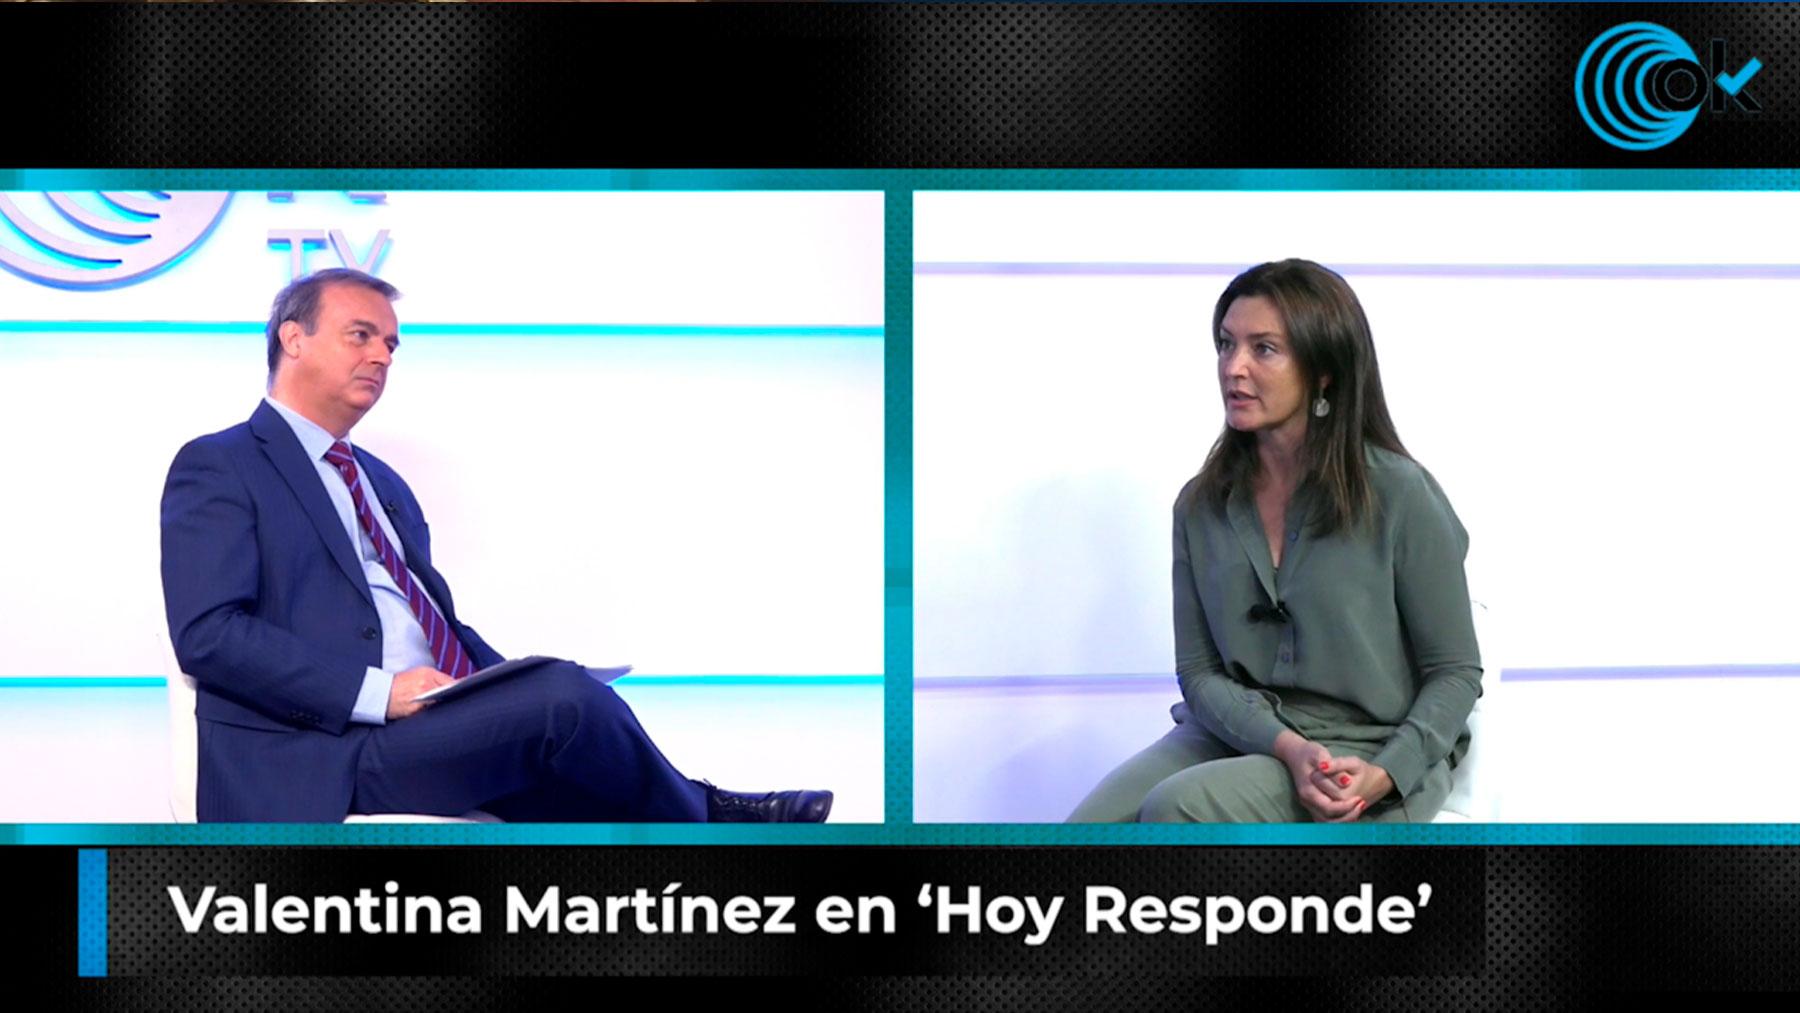 Valentina Martínez en Hoy Responde